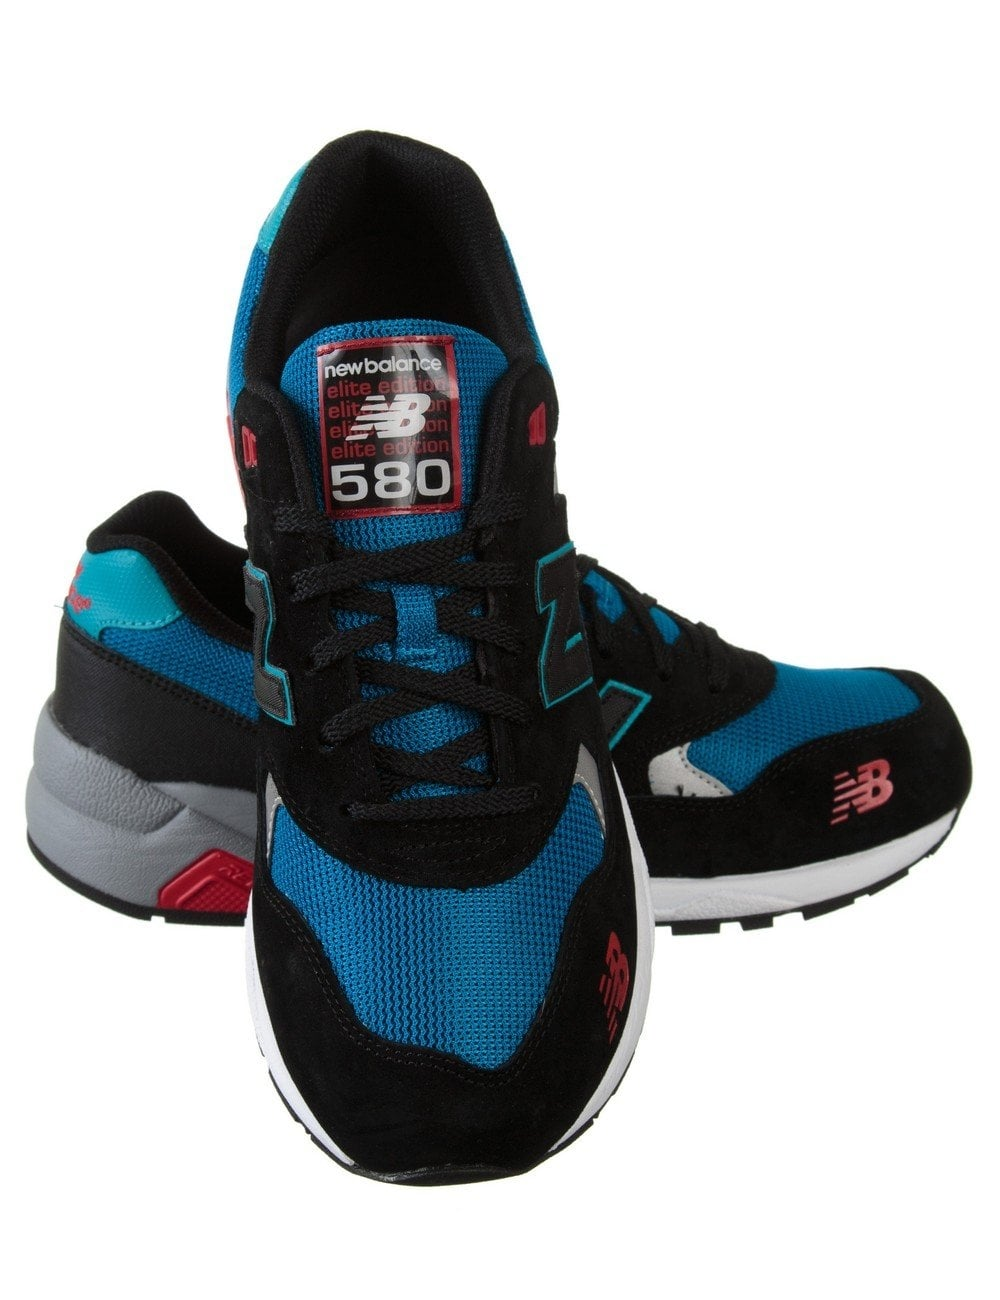 reputable site 7bb4e 0af31 MRT580BF Shoes - Black/Blue